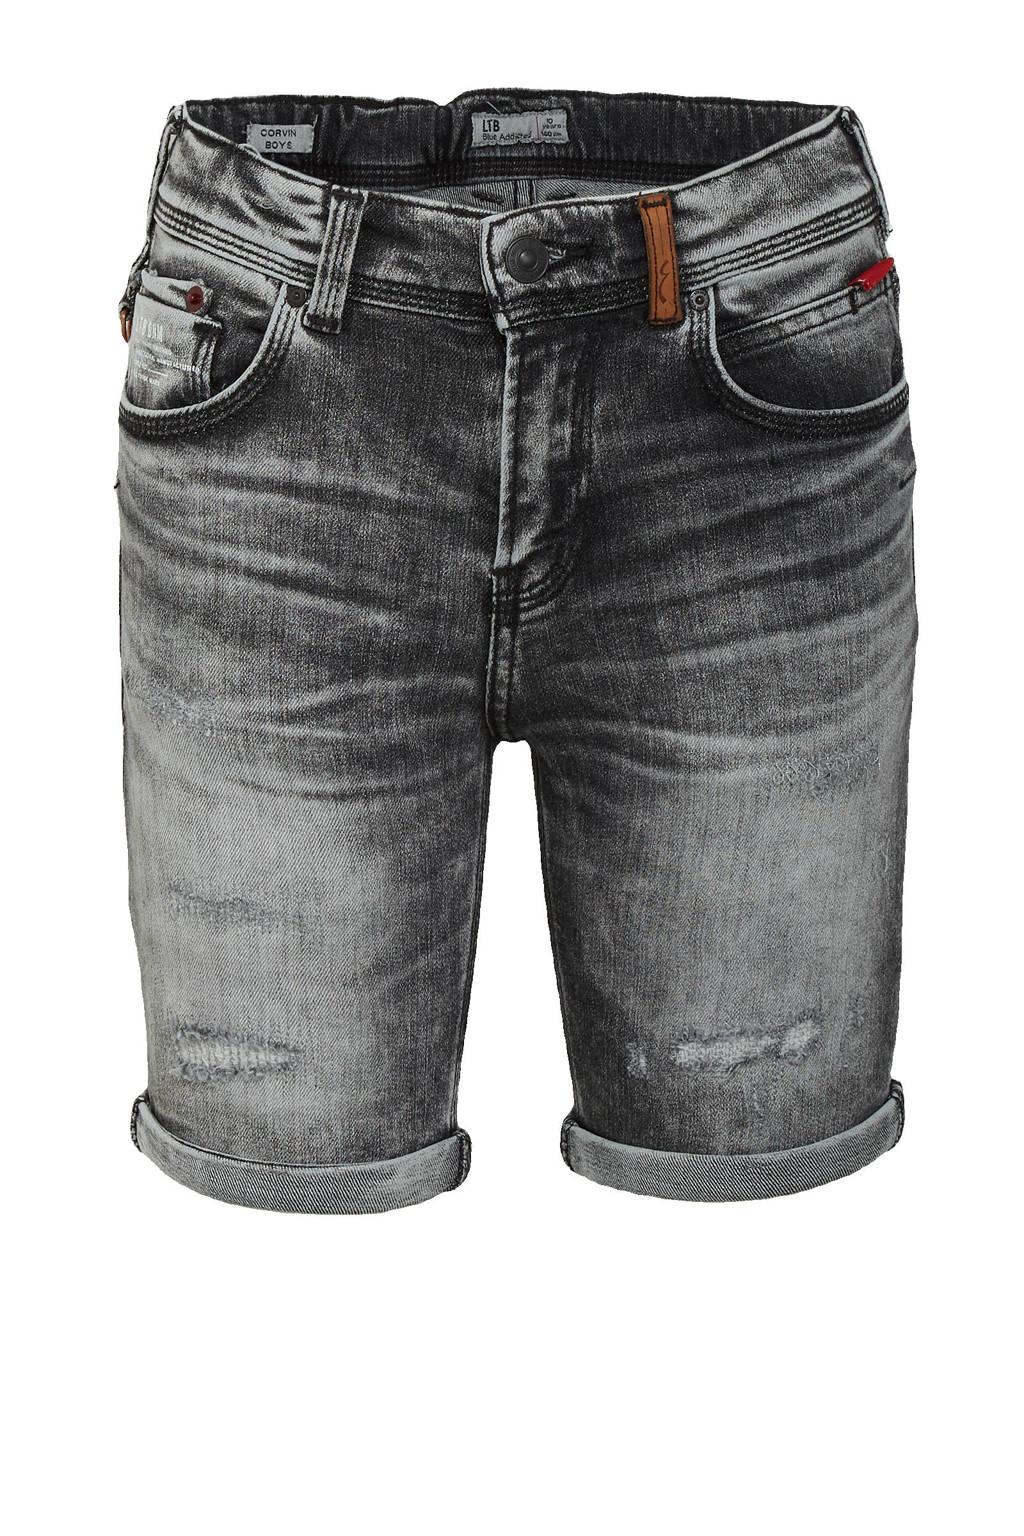 LTB slim fit jeans bermuda Corvin stone grey wash, Stone grey wash